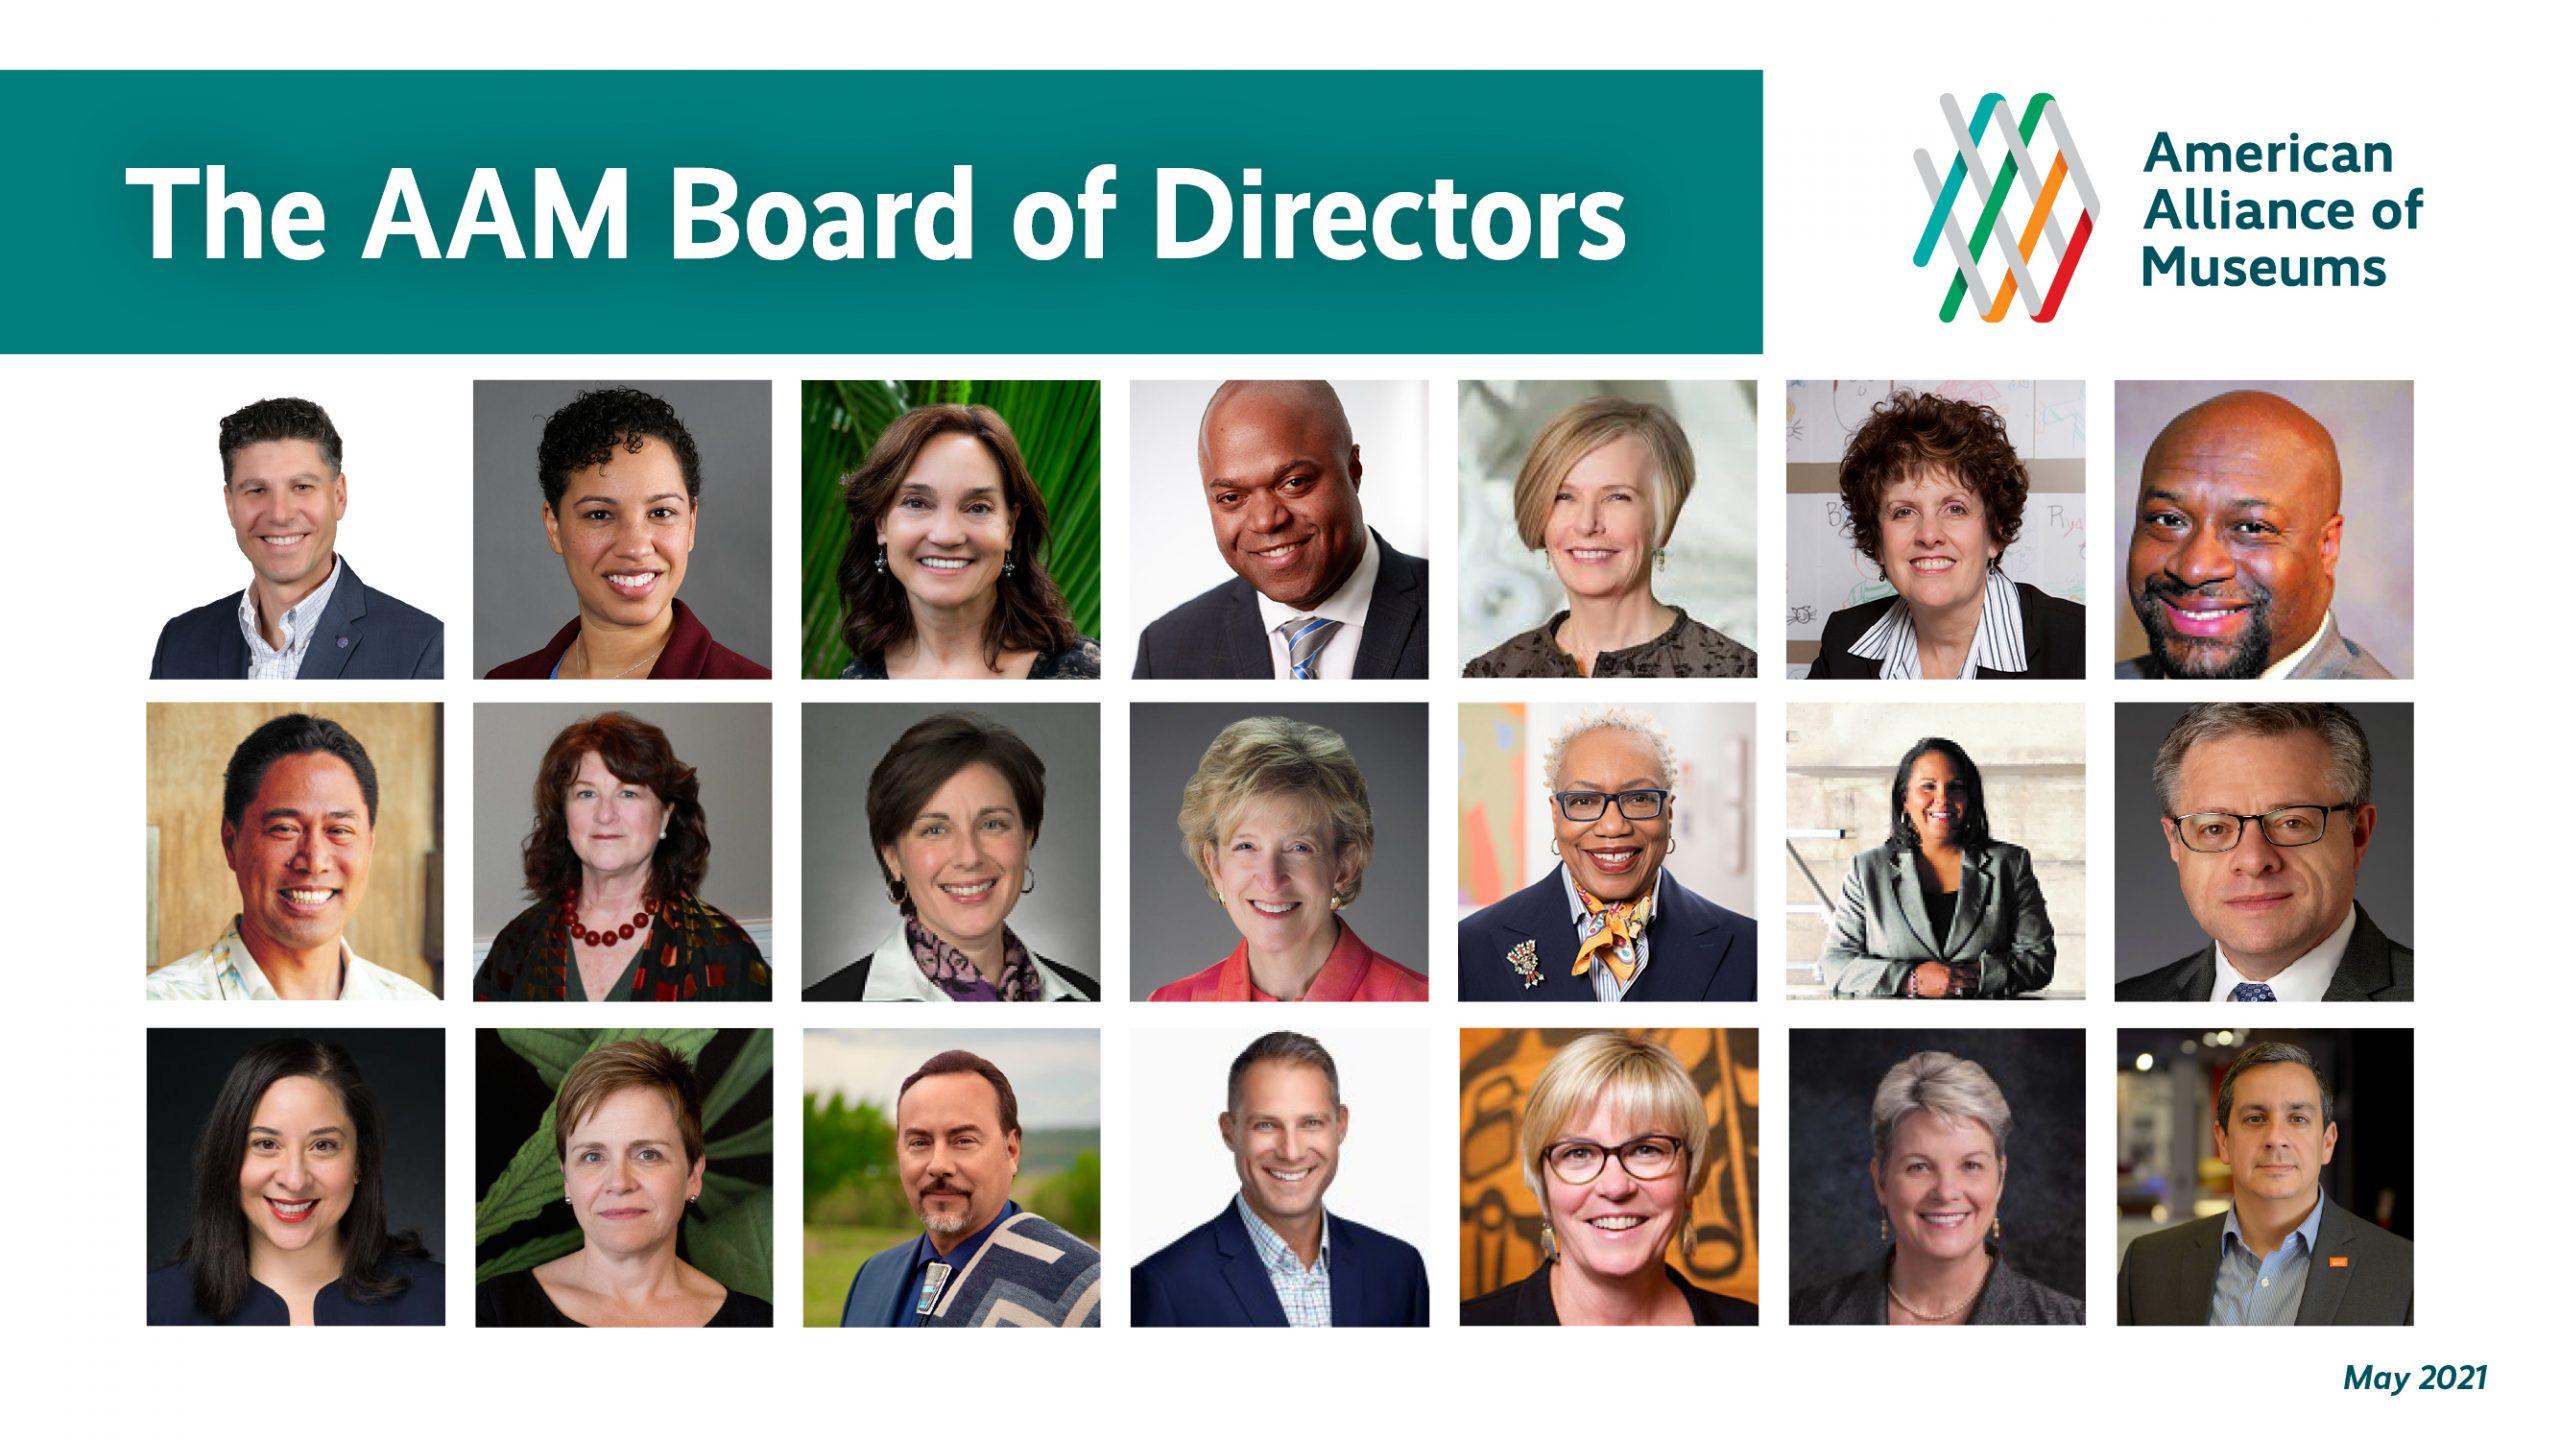 headshots of the AAM Board of Directors May 2021